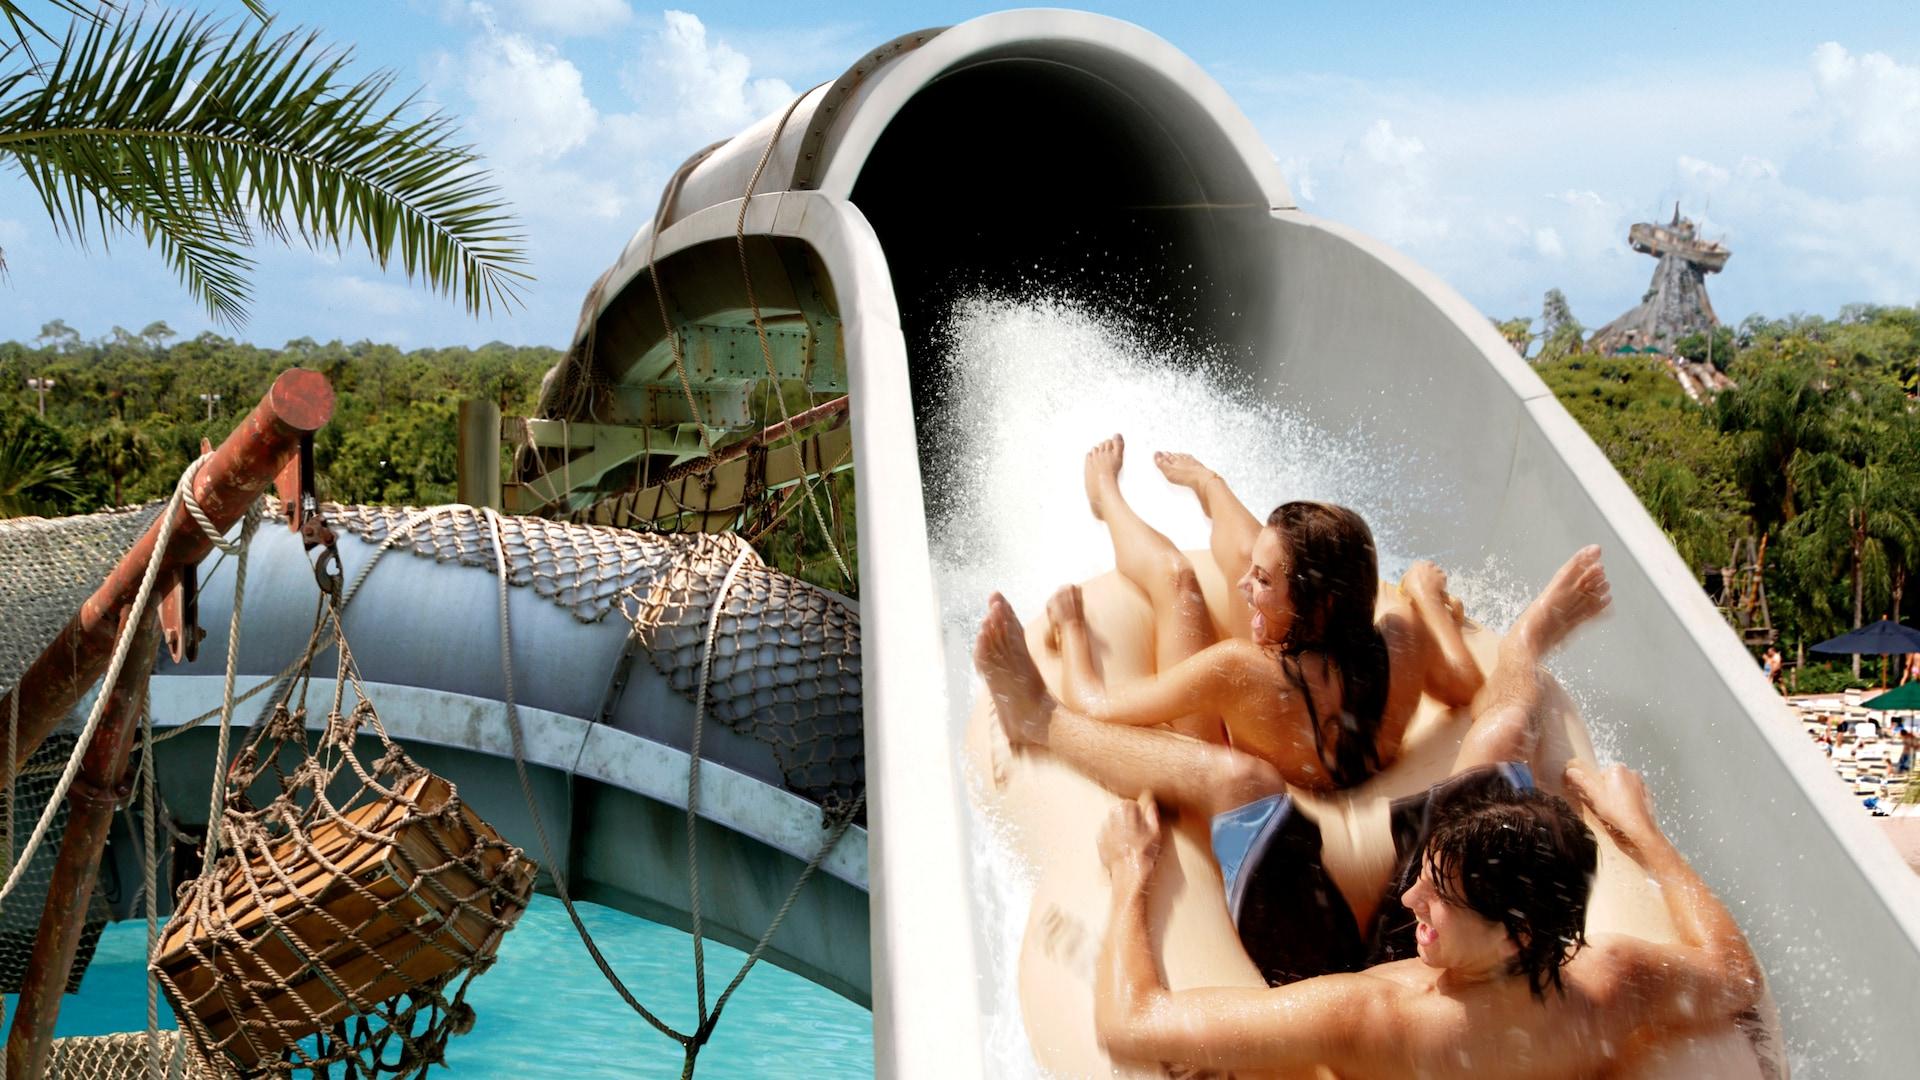 450243c4609c3 A couple sharing a raft slide backwards down Crush 'n' Gusher water coaster